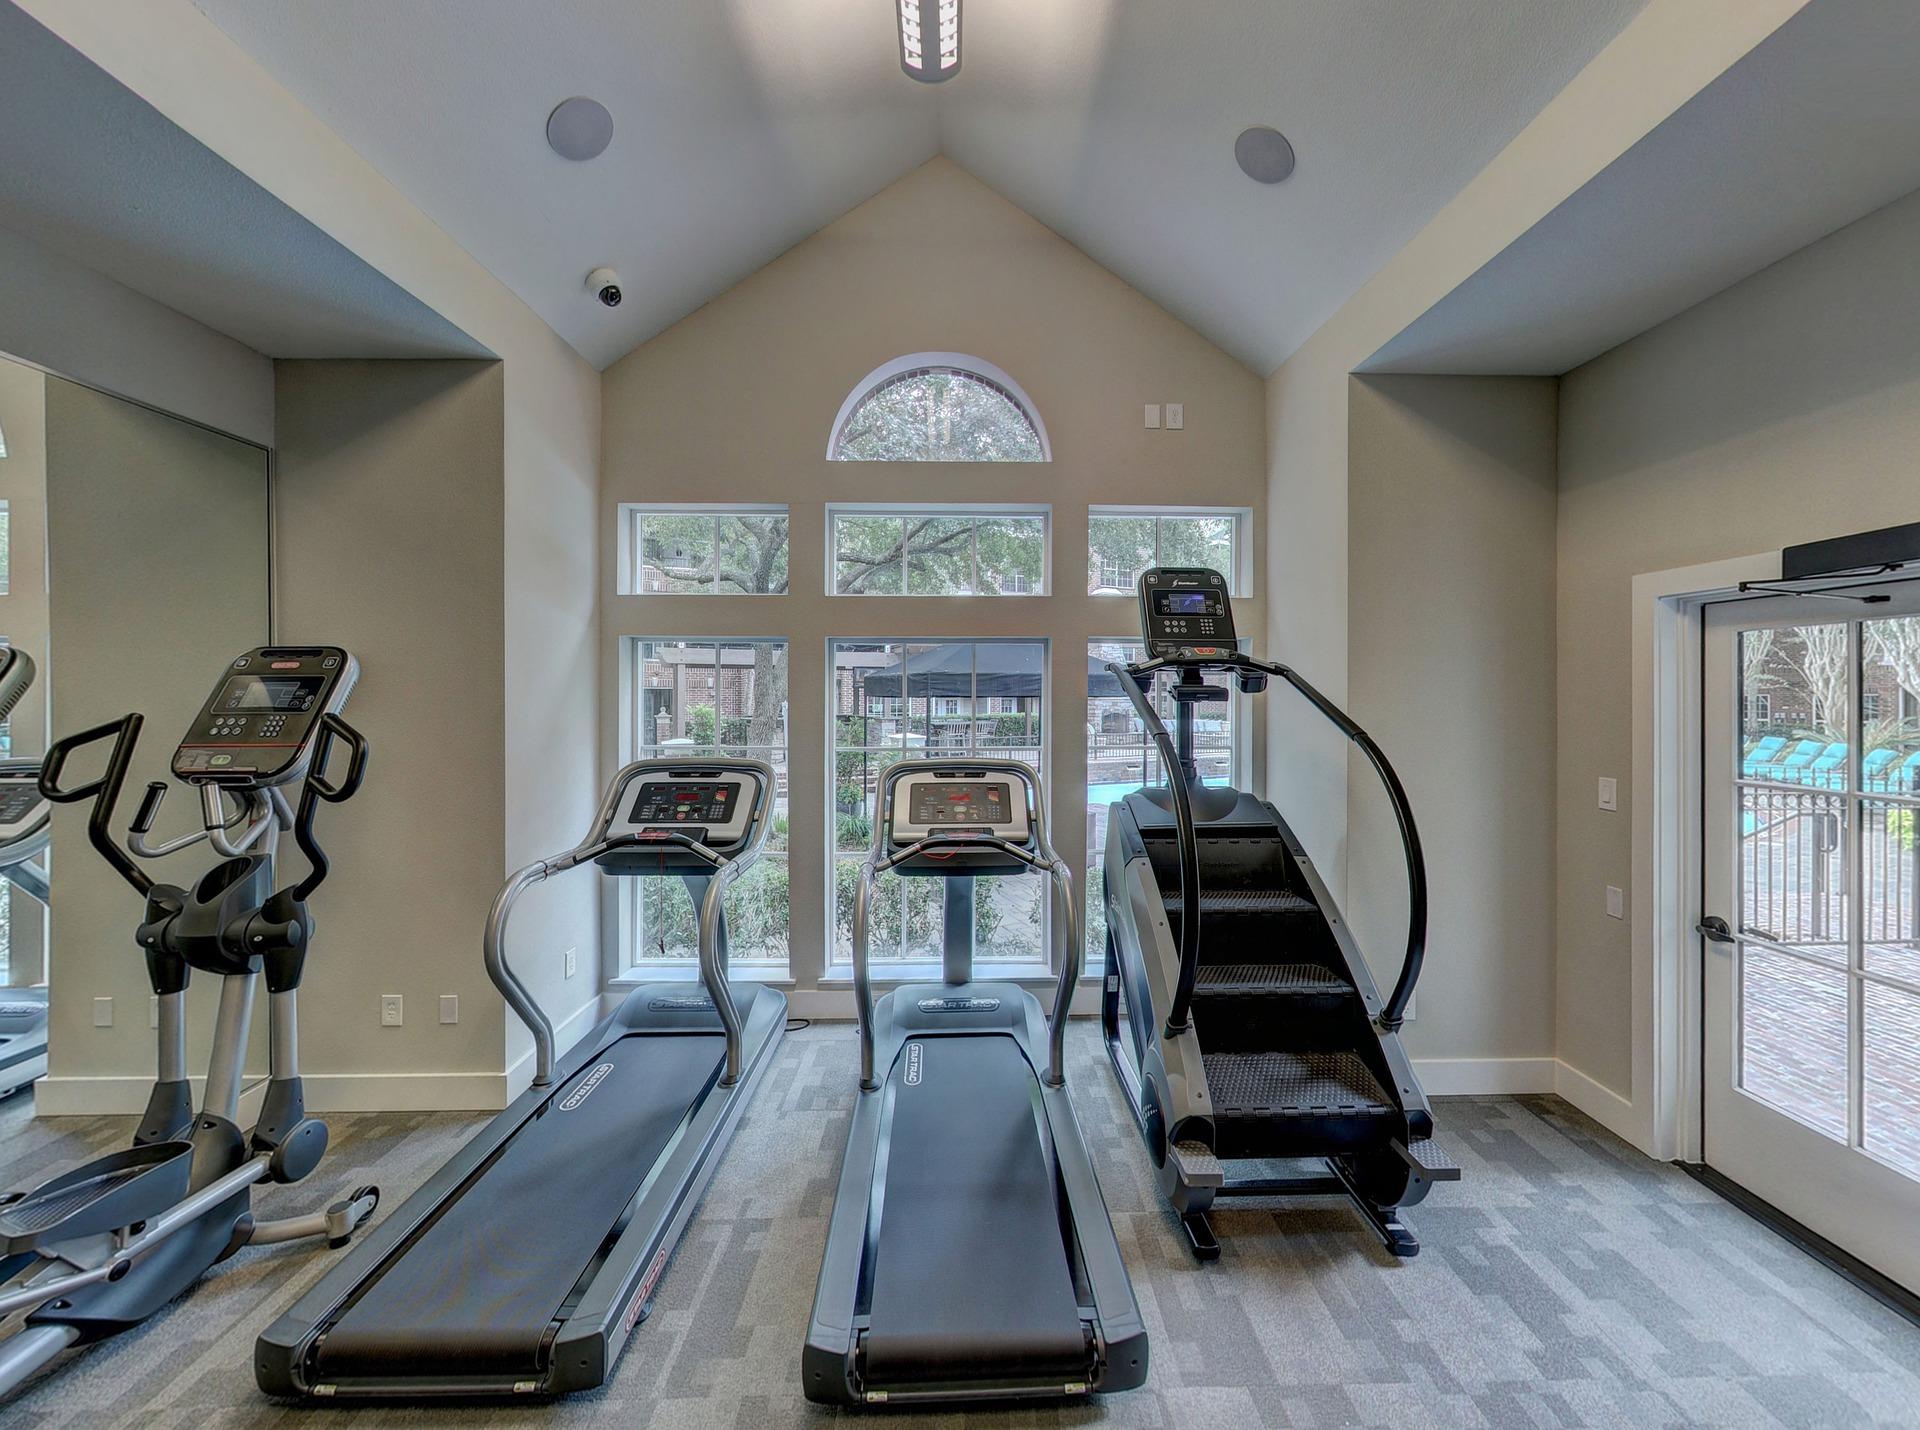 2 home-workout-gfd80ce50a_1920